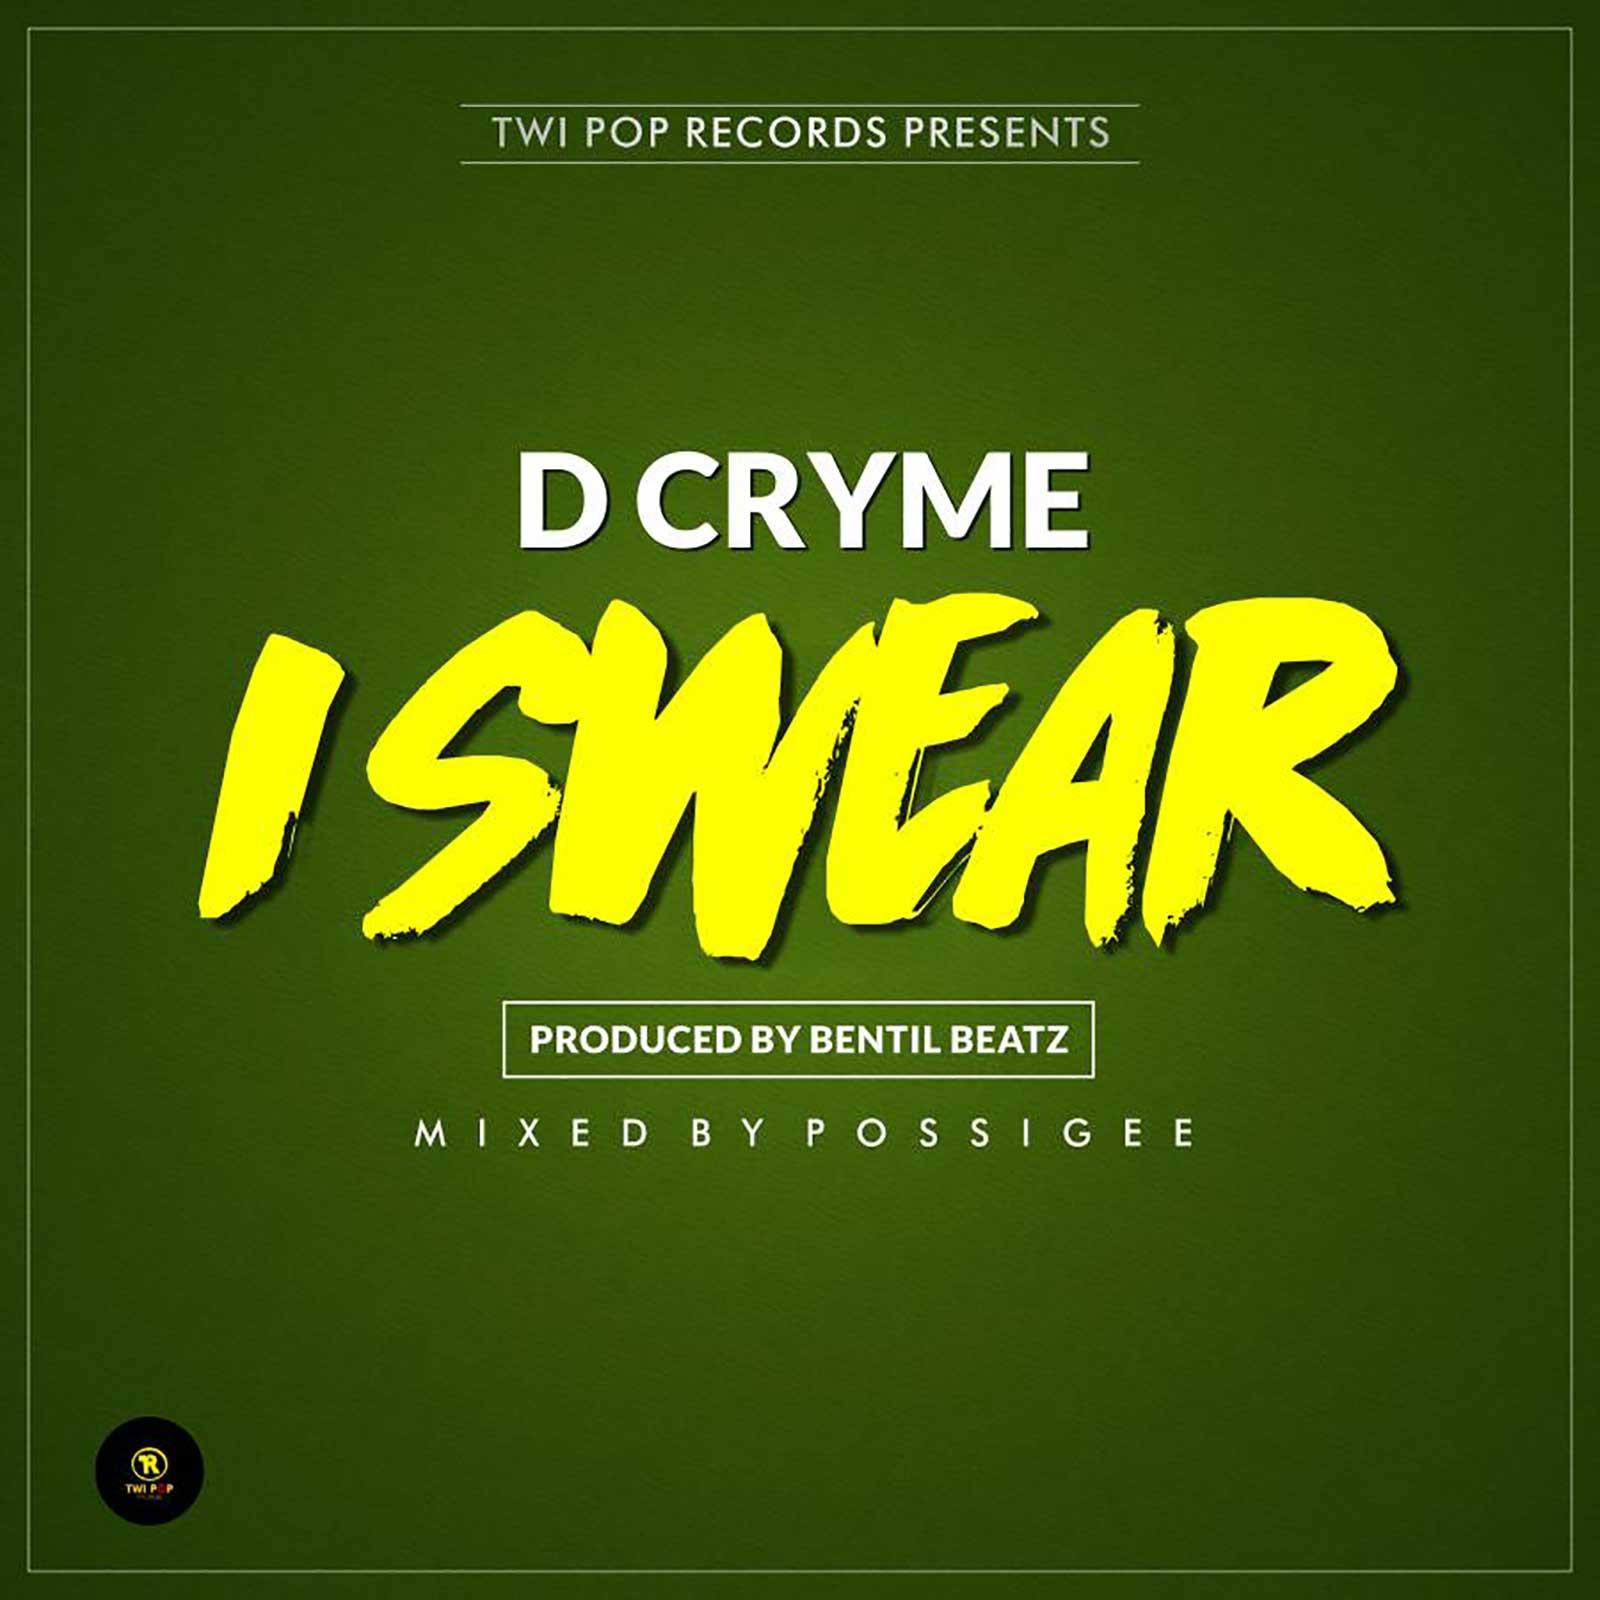 I Swear by Dr. Cryme